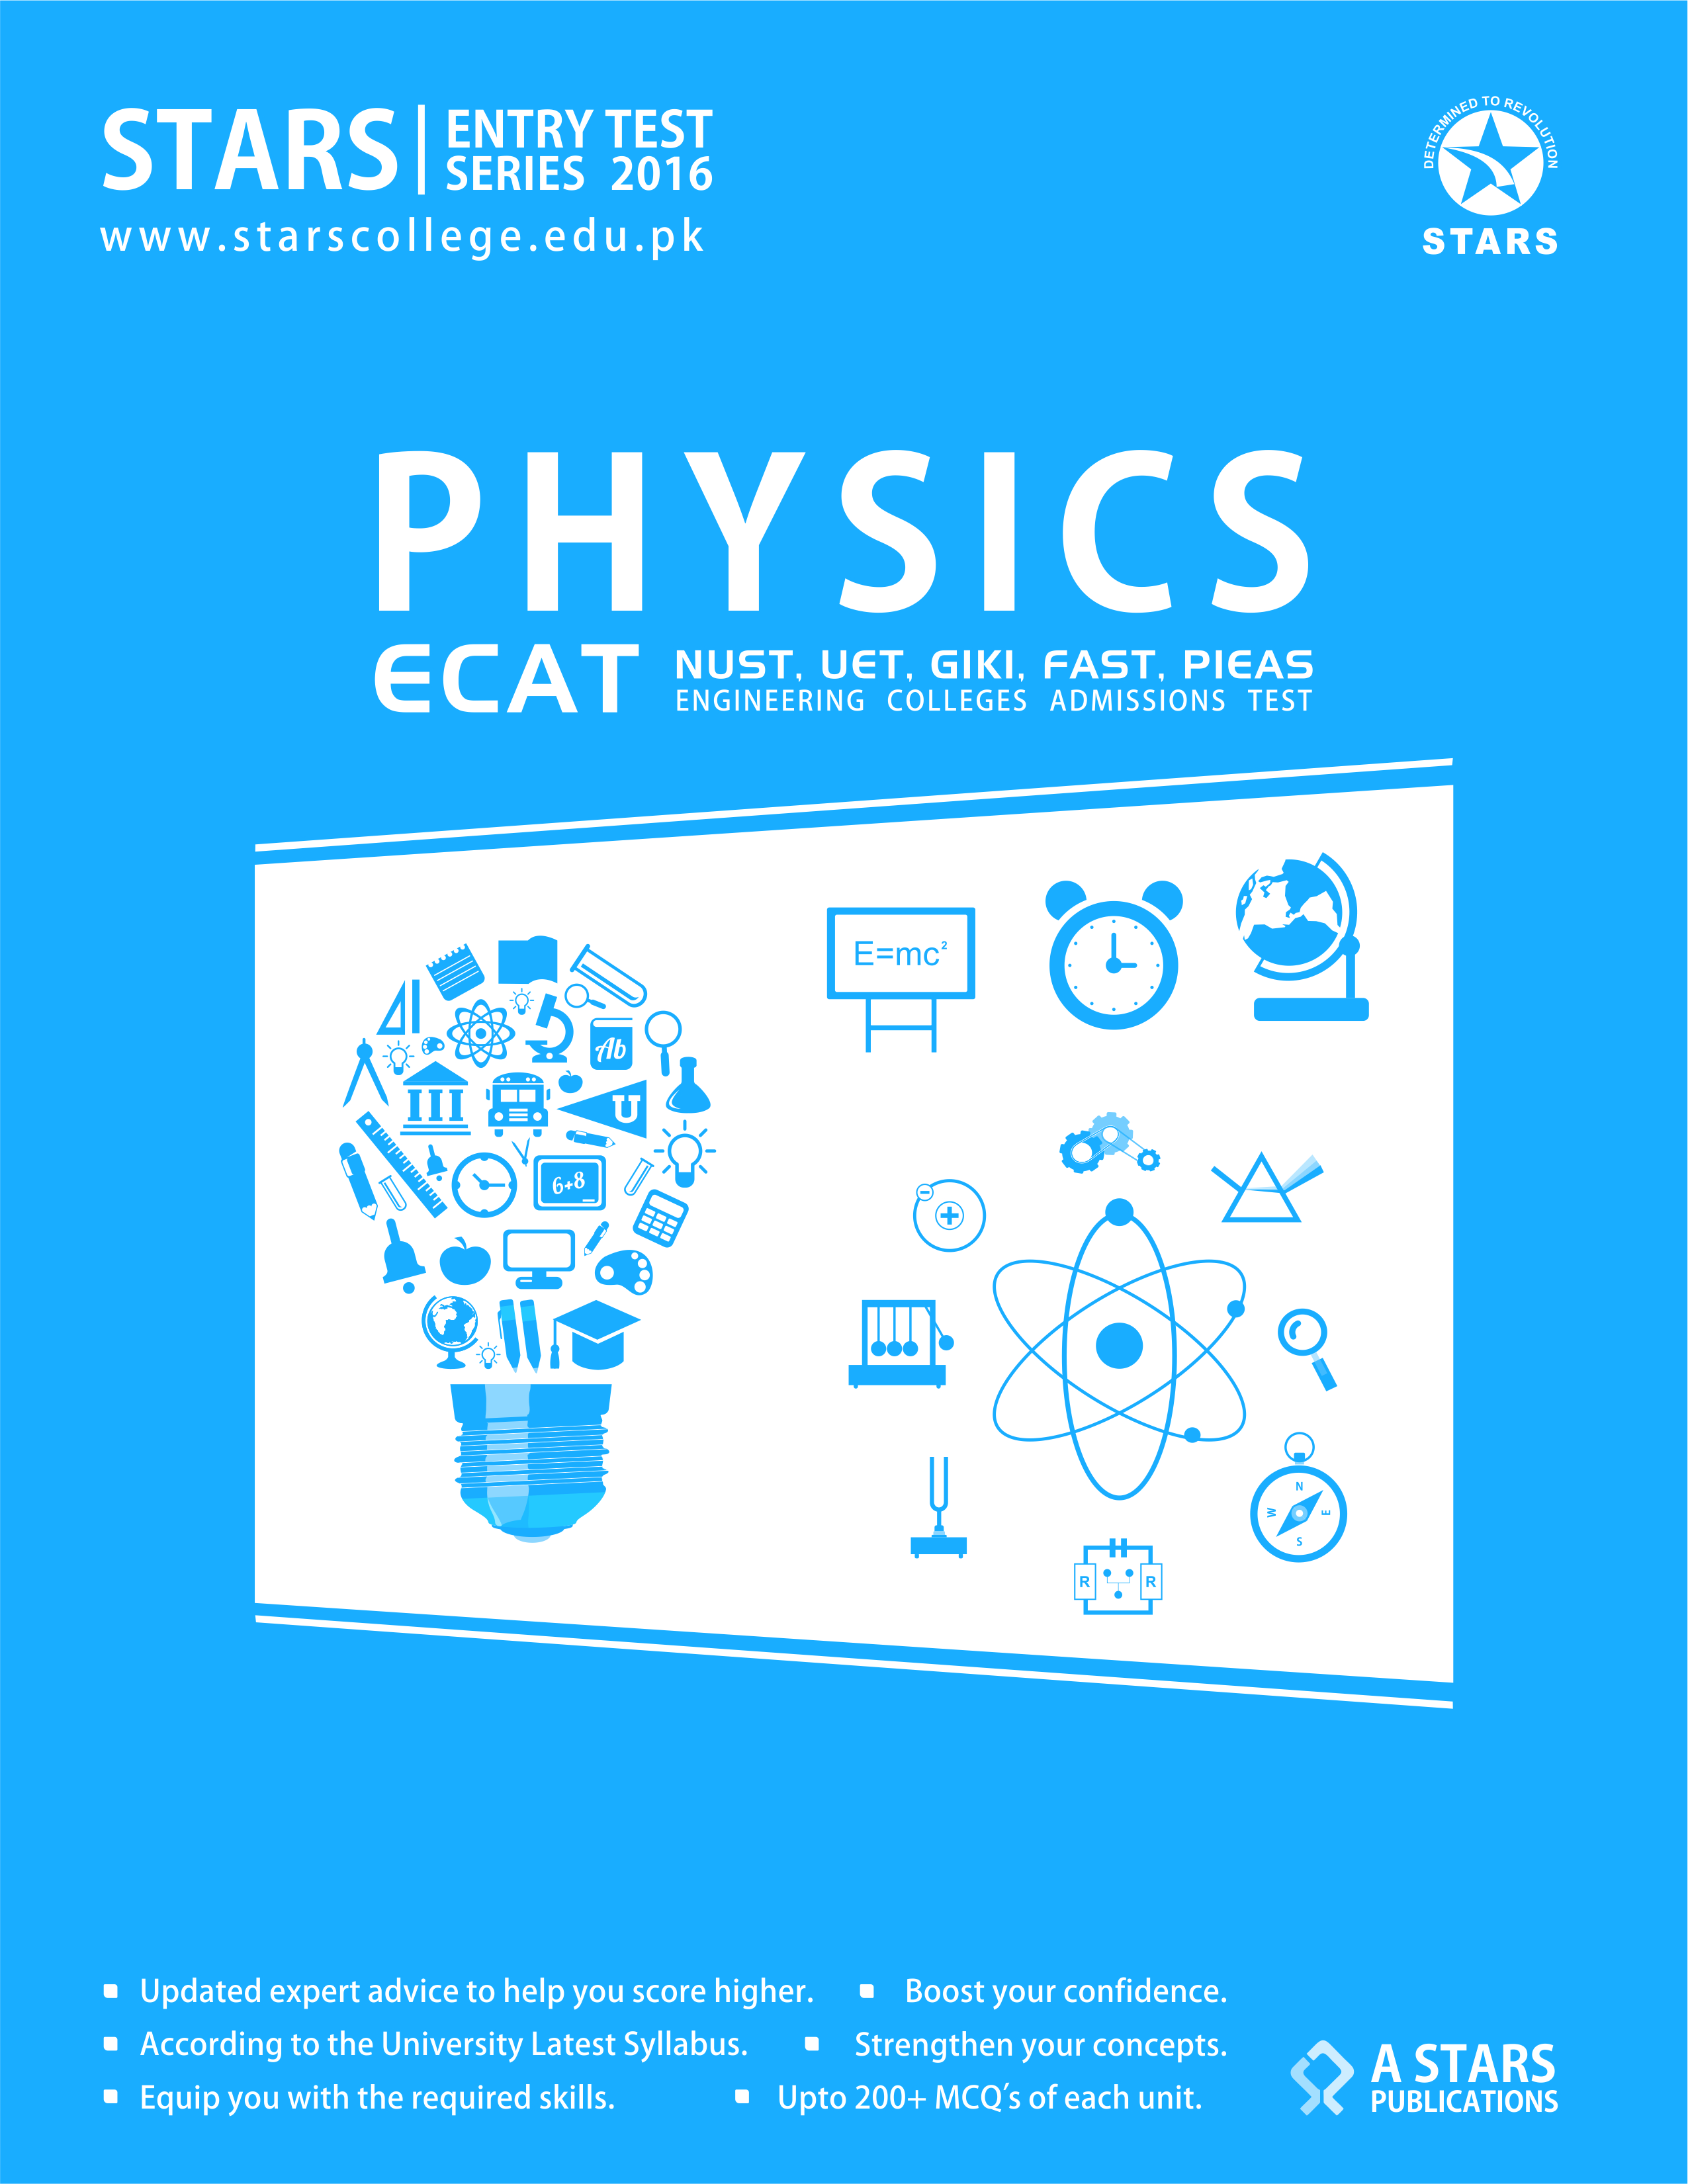 ECAT | Stars Academy | Stars Entry Test | Stars | Entry Test